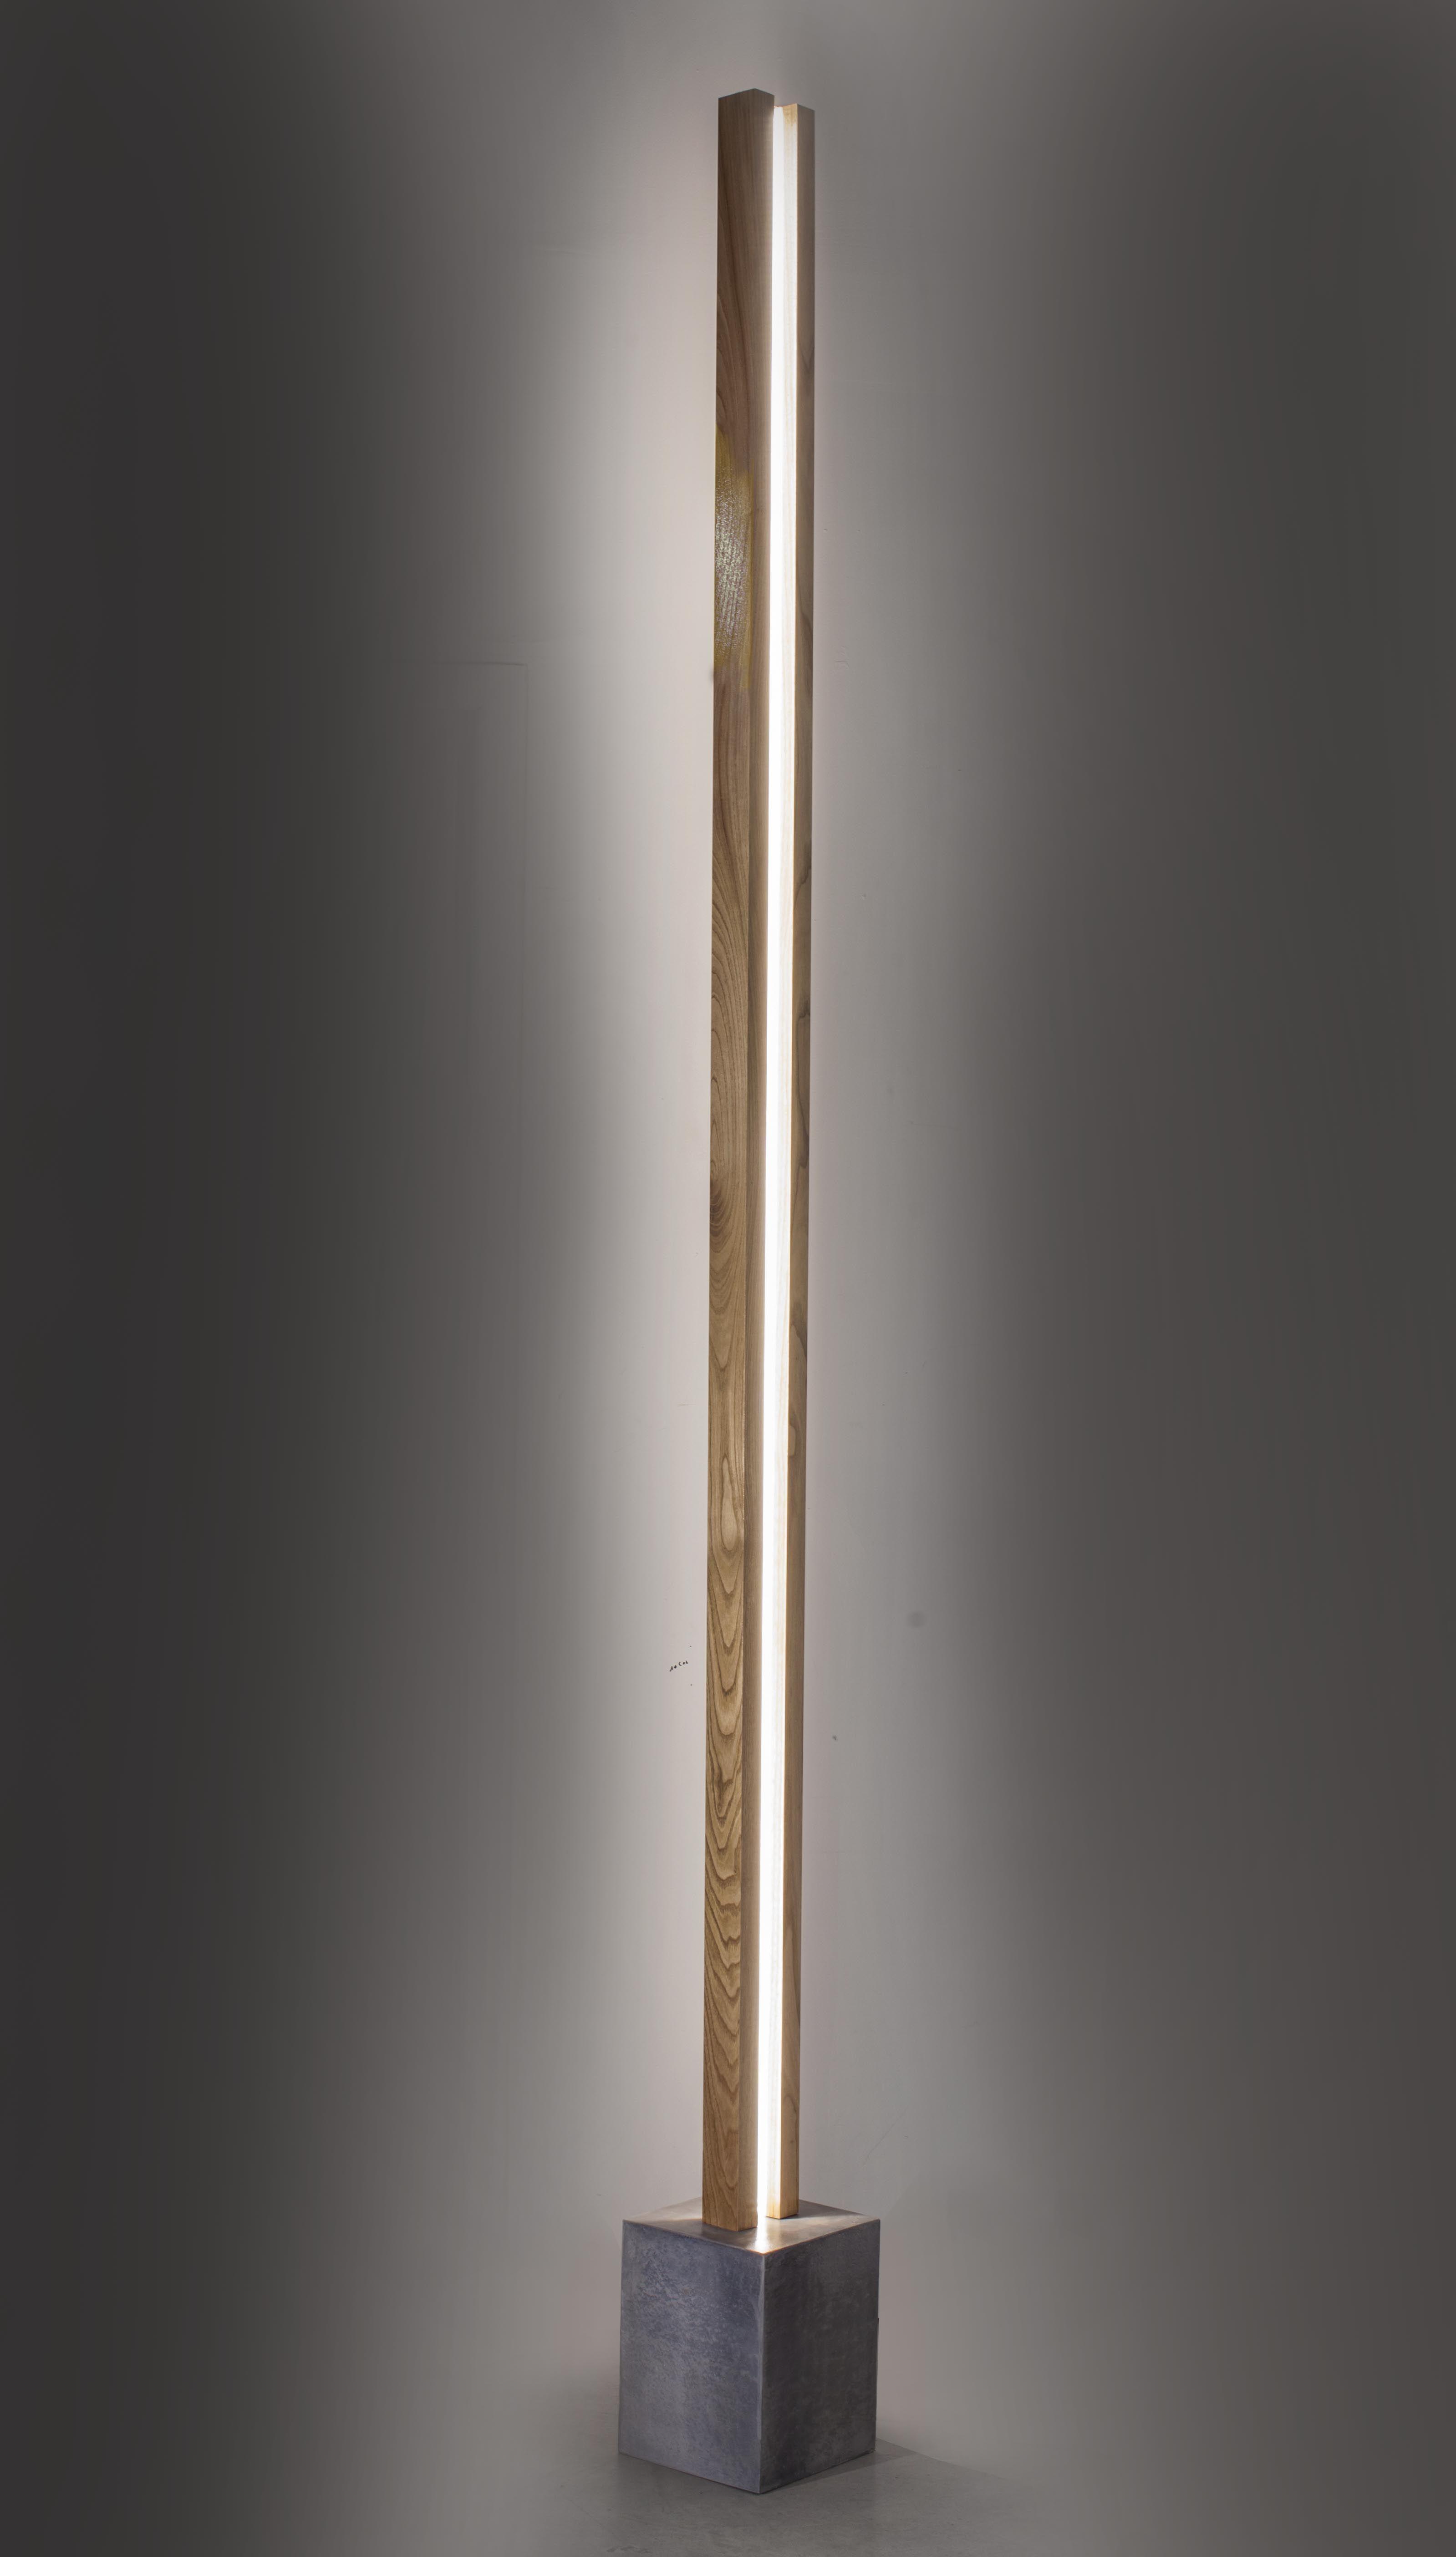 The Lubois : a floor lamp with a clear LED light strip ...